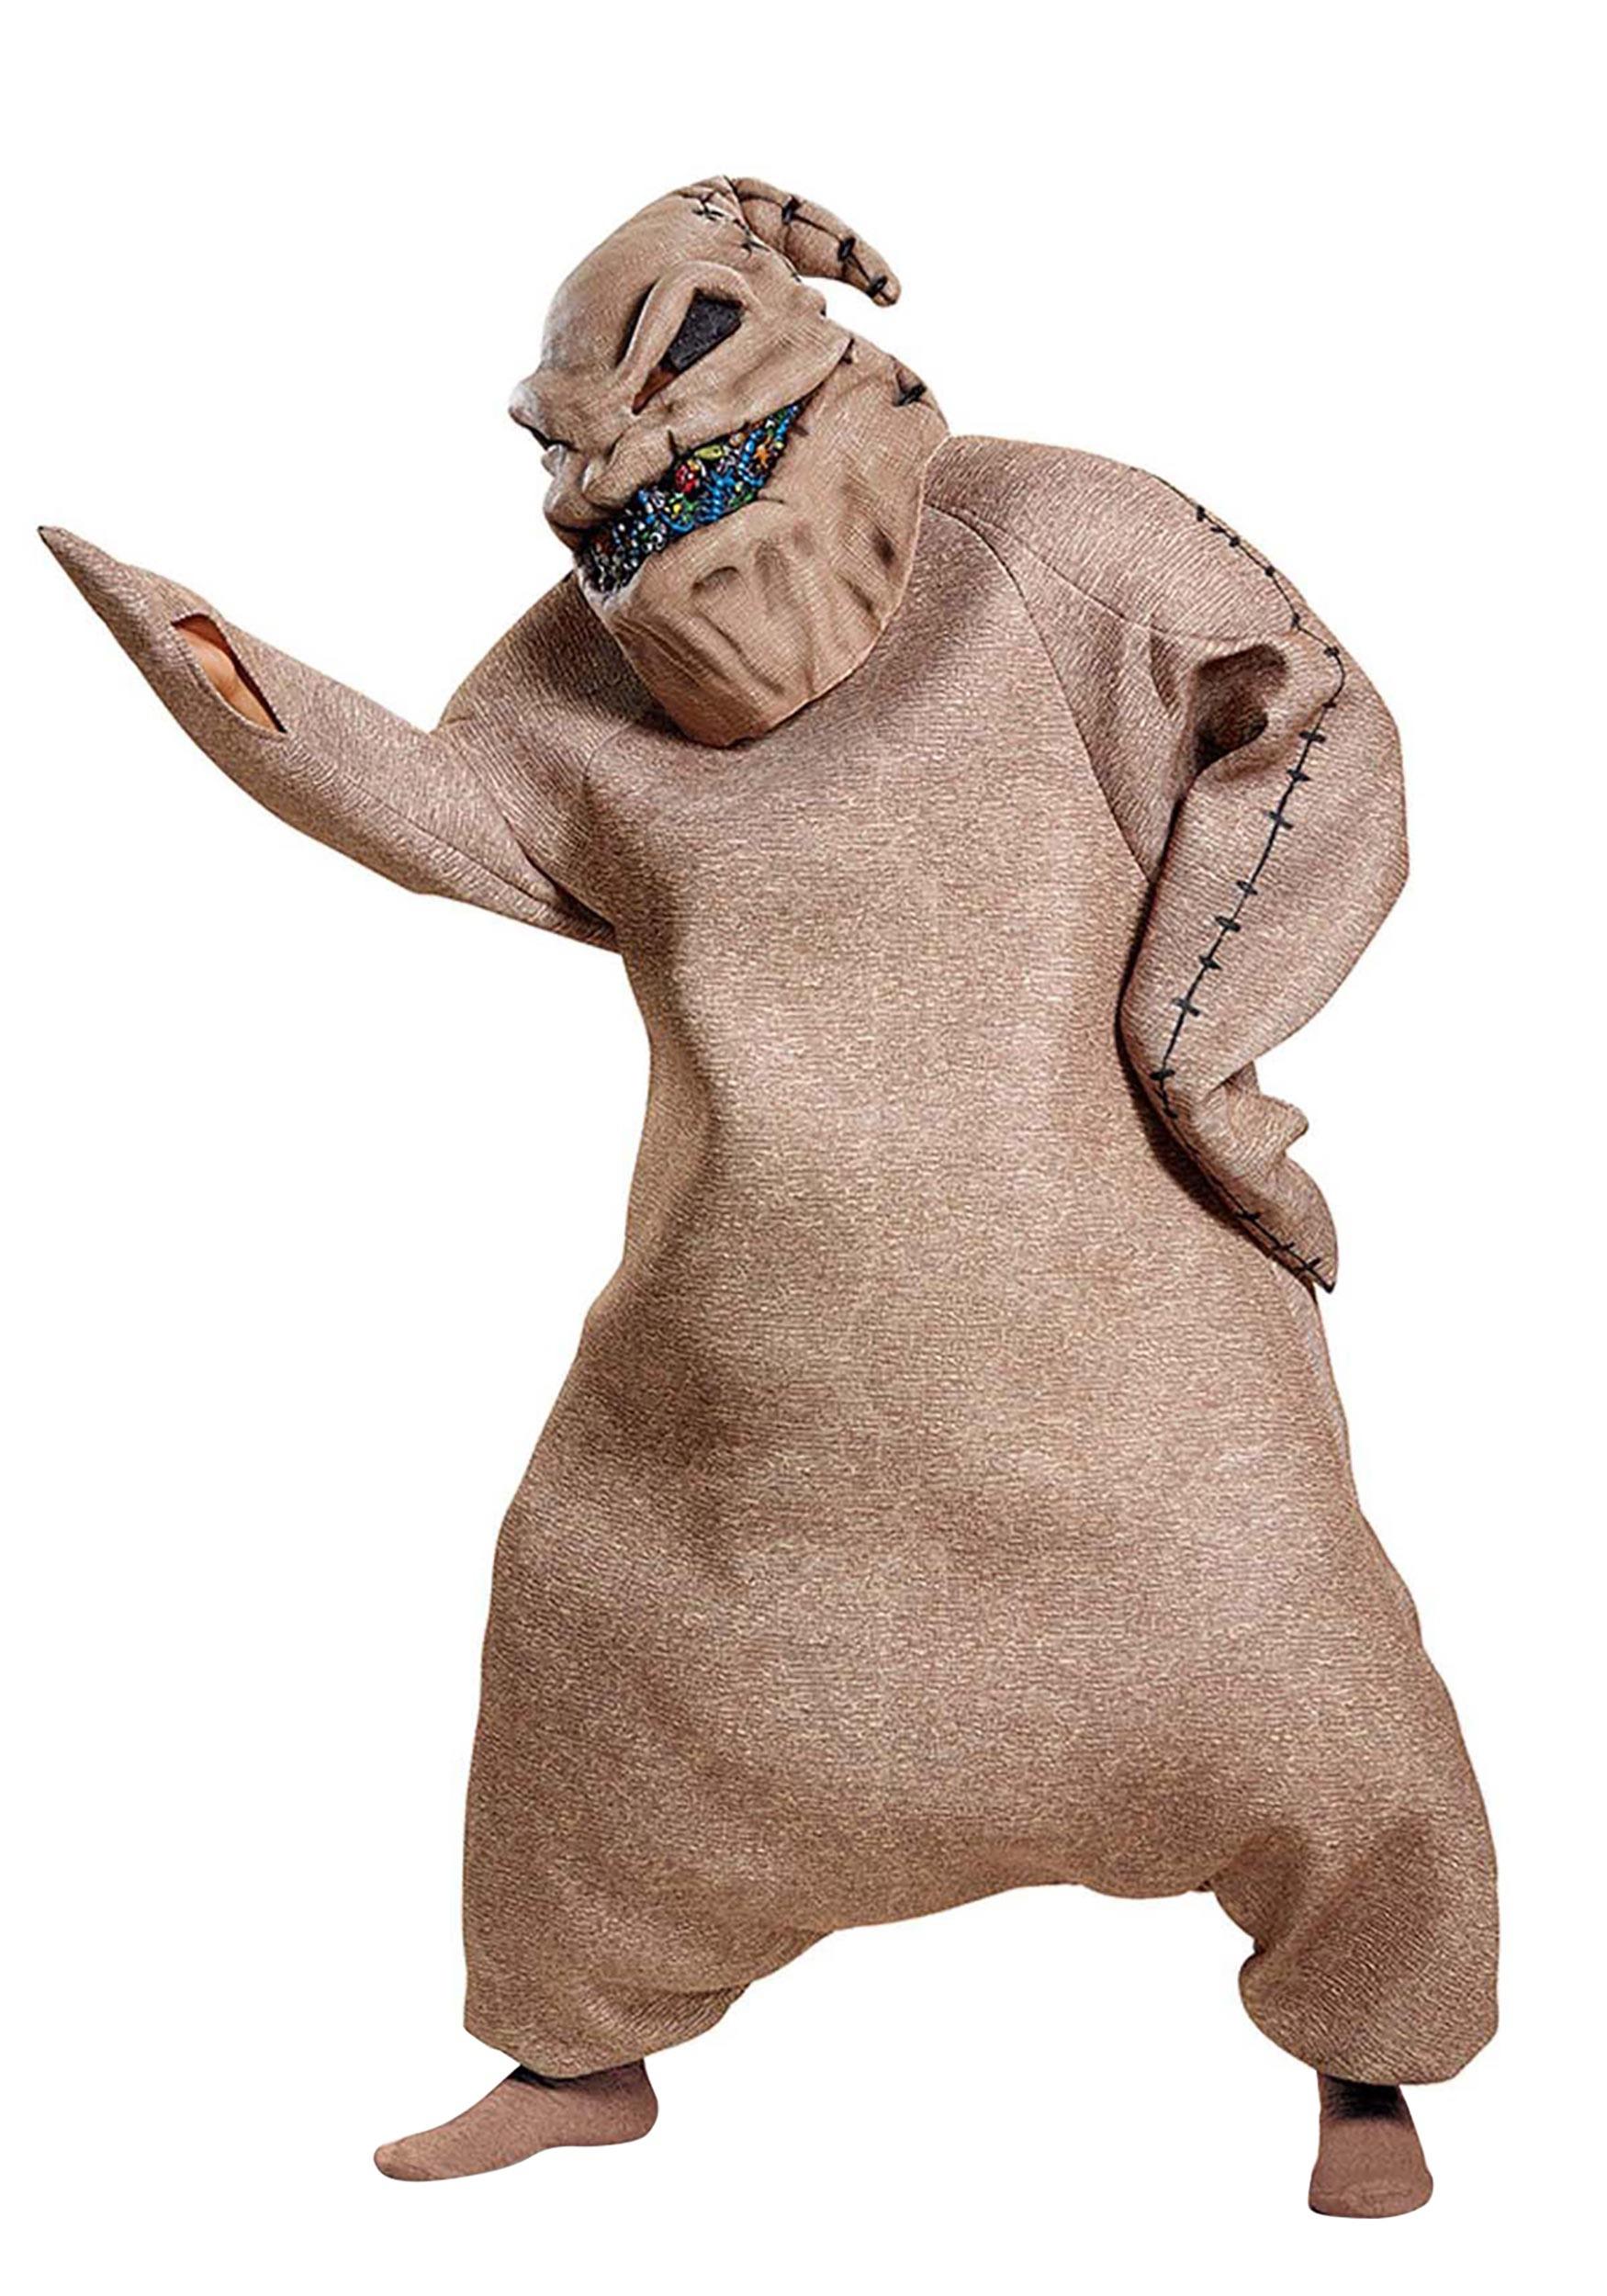 7cf1ae4c3a8 Oogie Boogie Prestige Costume from Nightmare Before Christmas